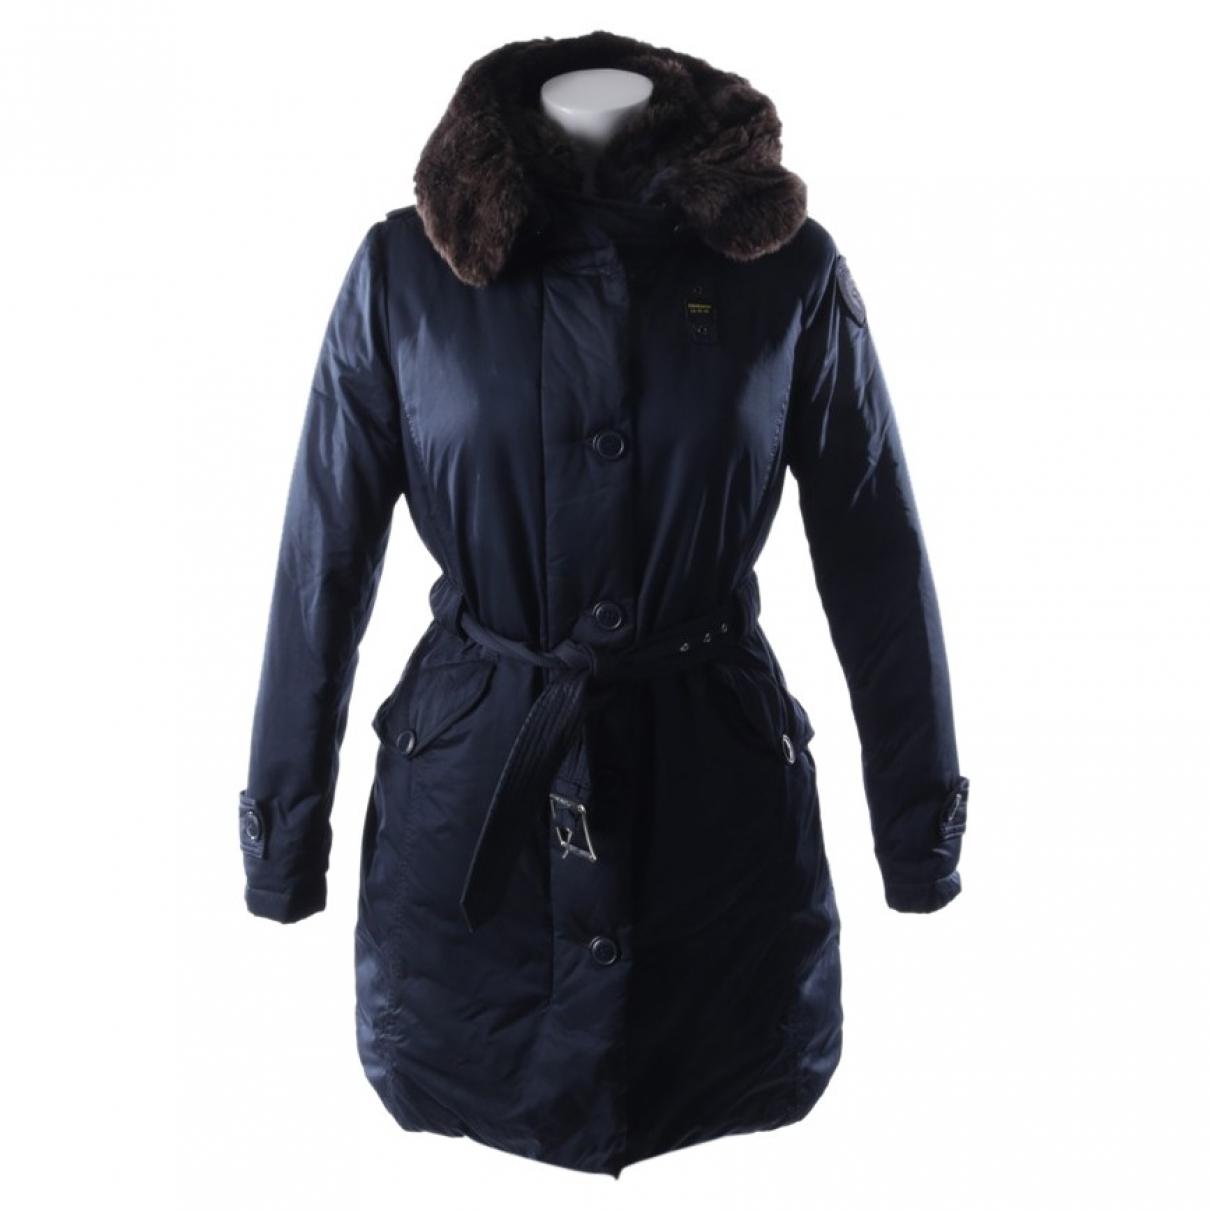 Blauer \N Blue jacket for Women 38 FR